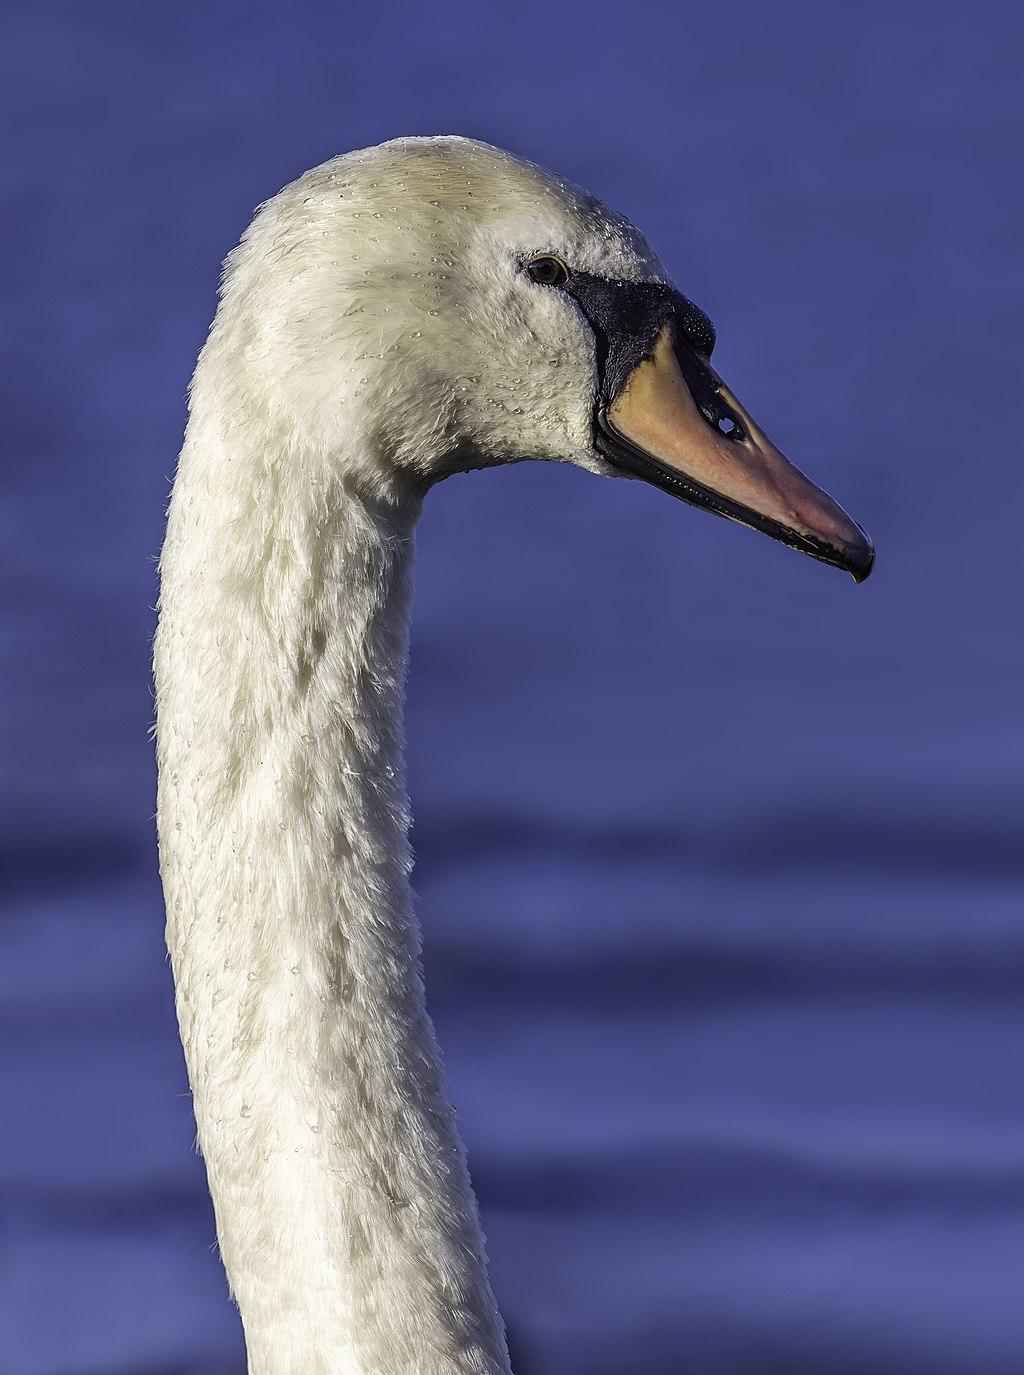 Mute swan (Cygnus olor) in Bowness-on-Windermere, England.jpg